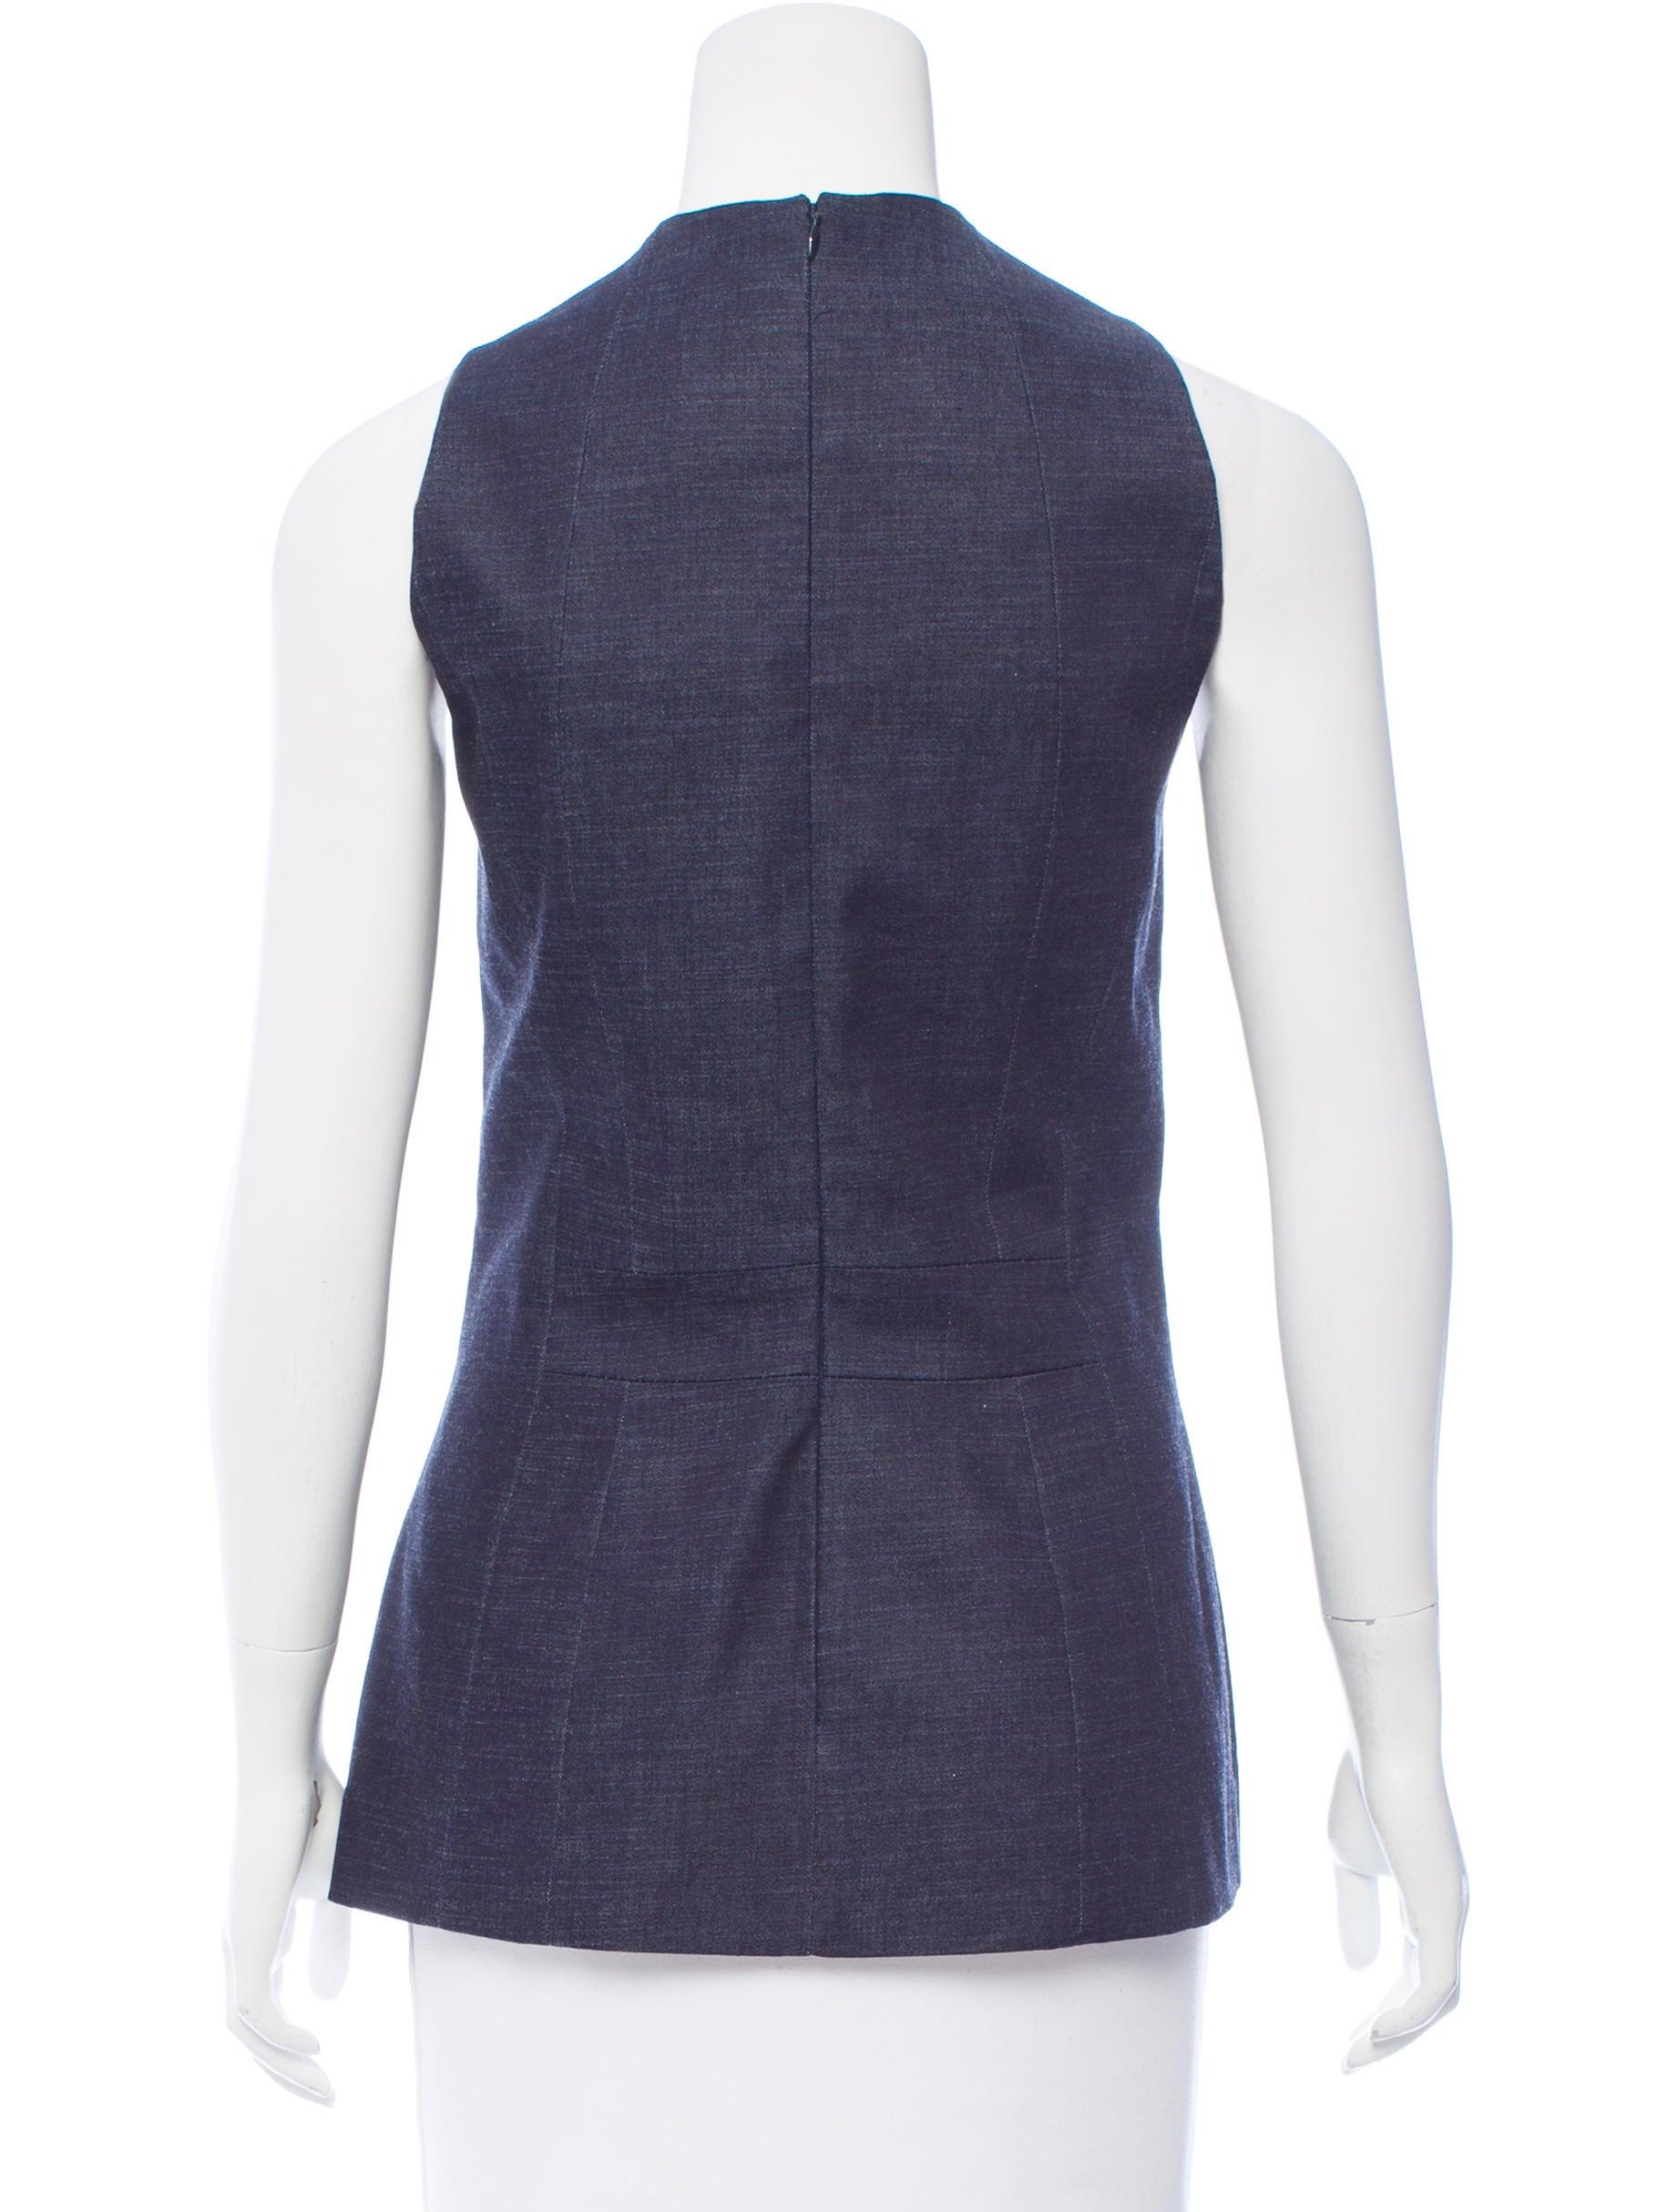 Victoria Beckham Jeans Denim Peplum Top W Tags Clothing